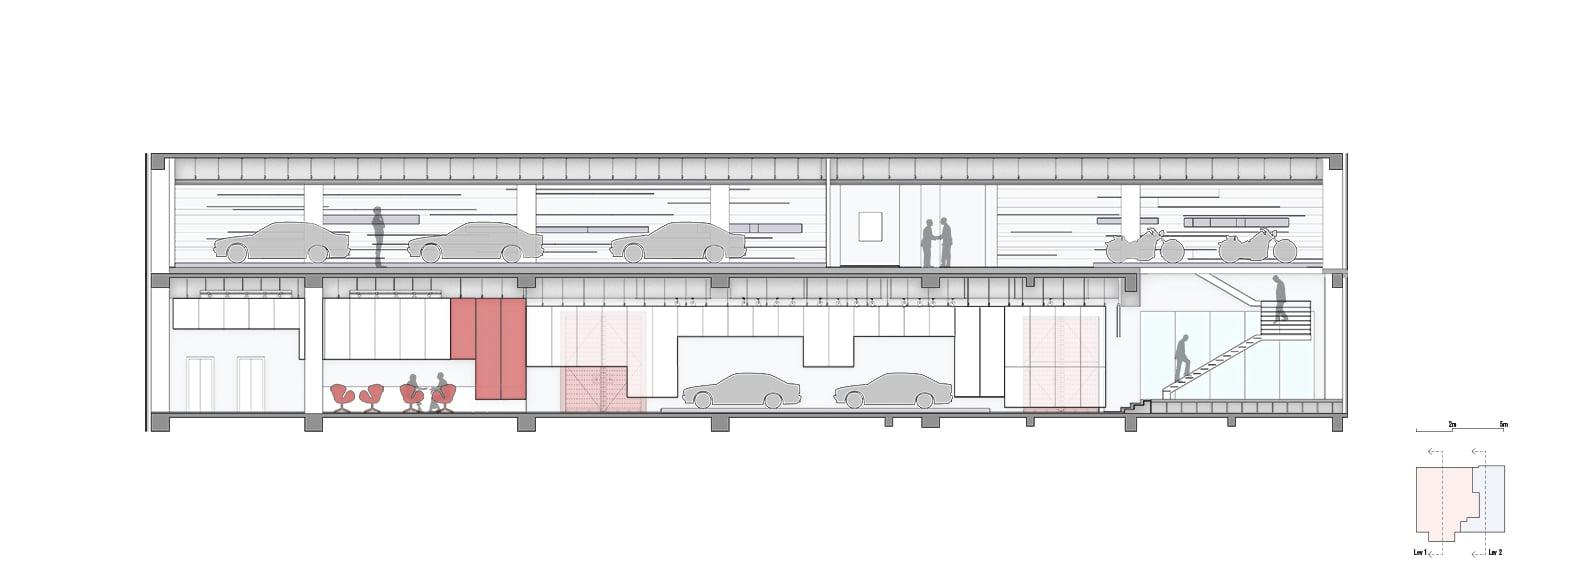 Zhengtong BMW Museum, section Crossboundaries}